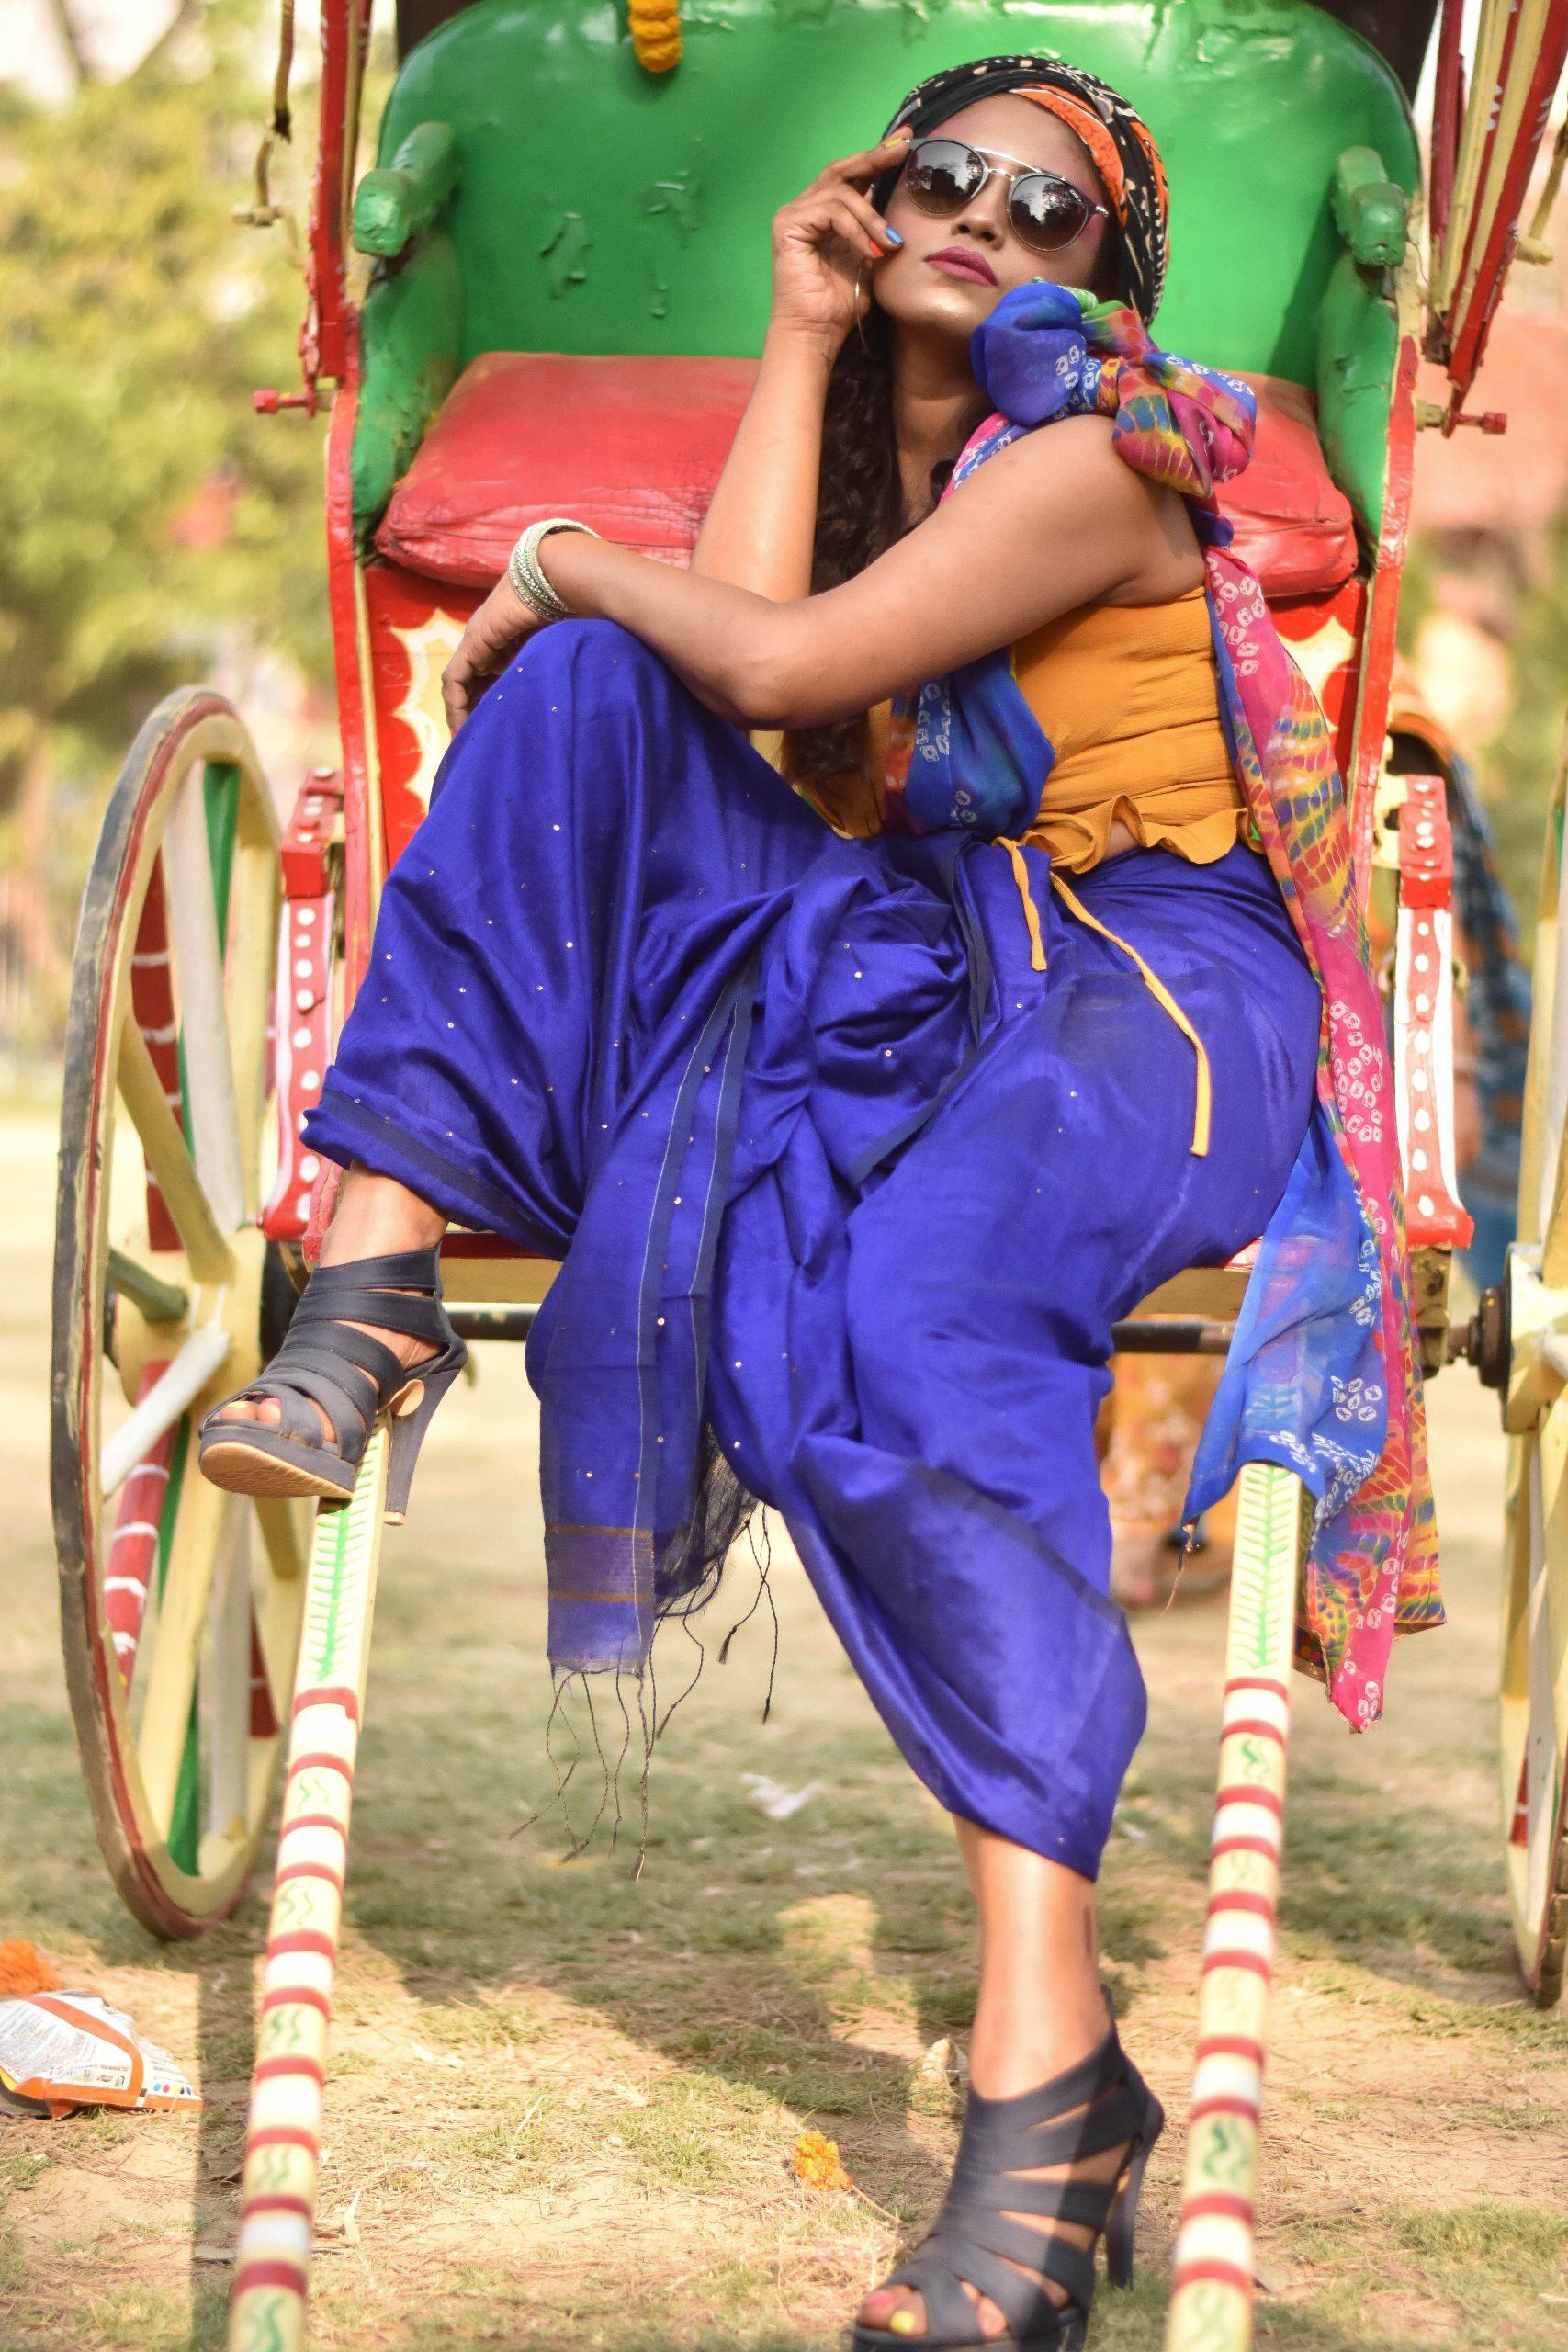 A village girl on a cart